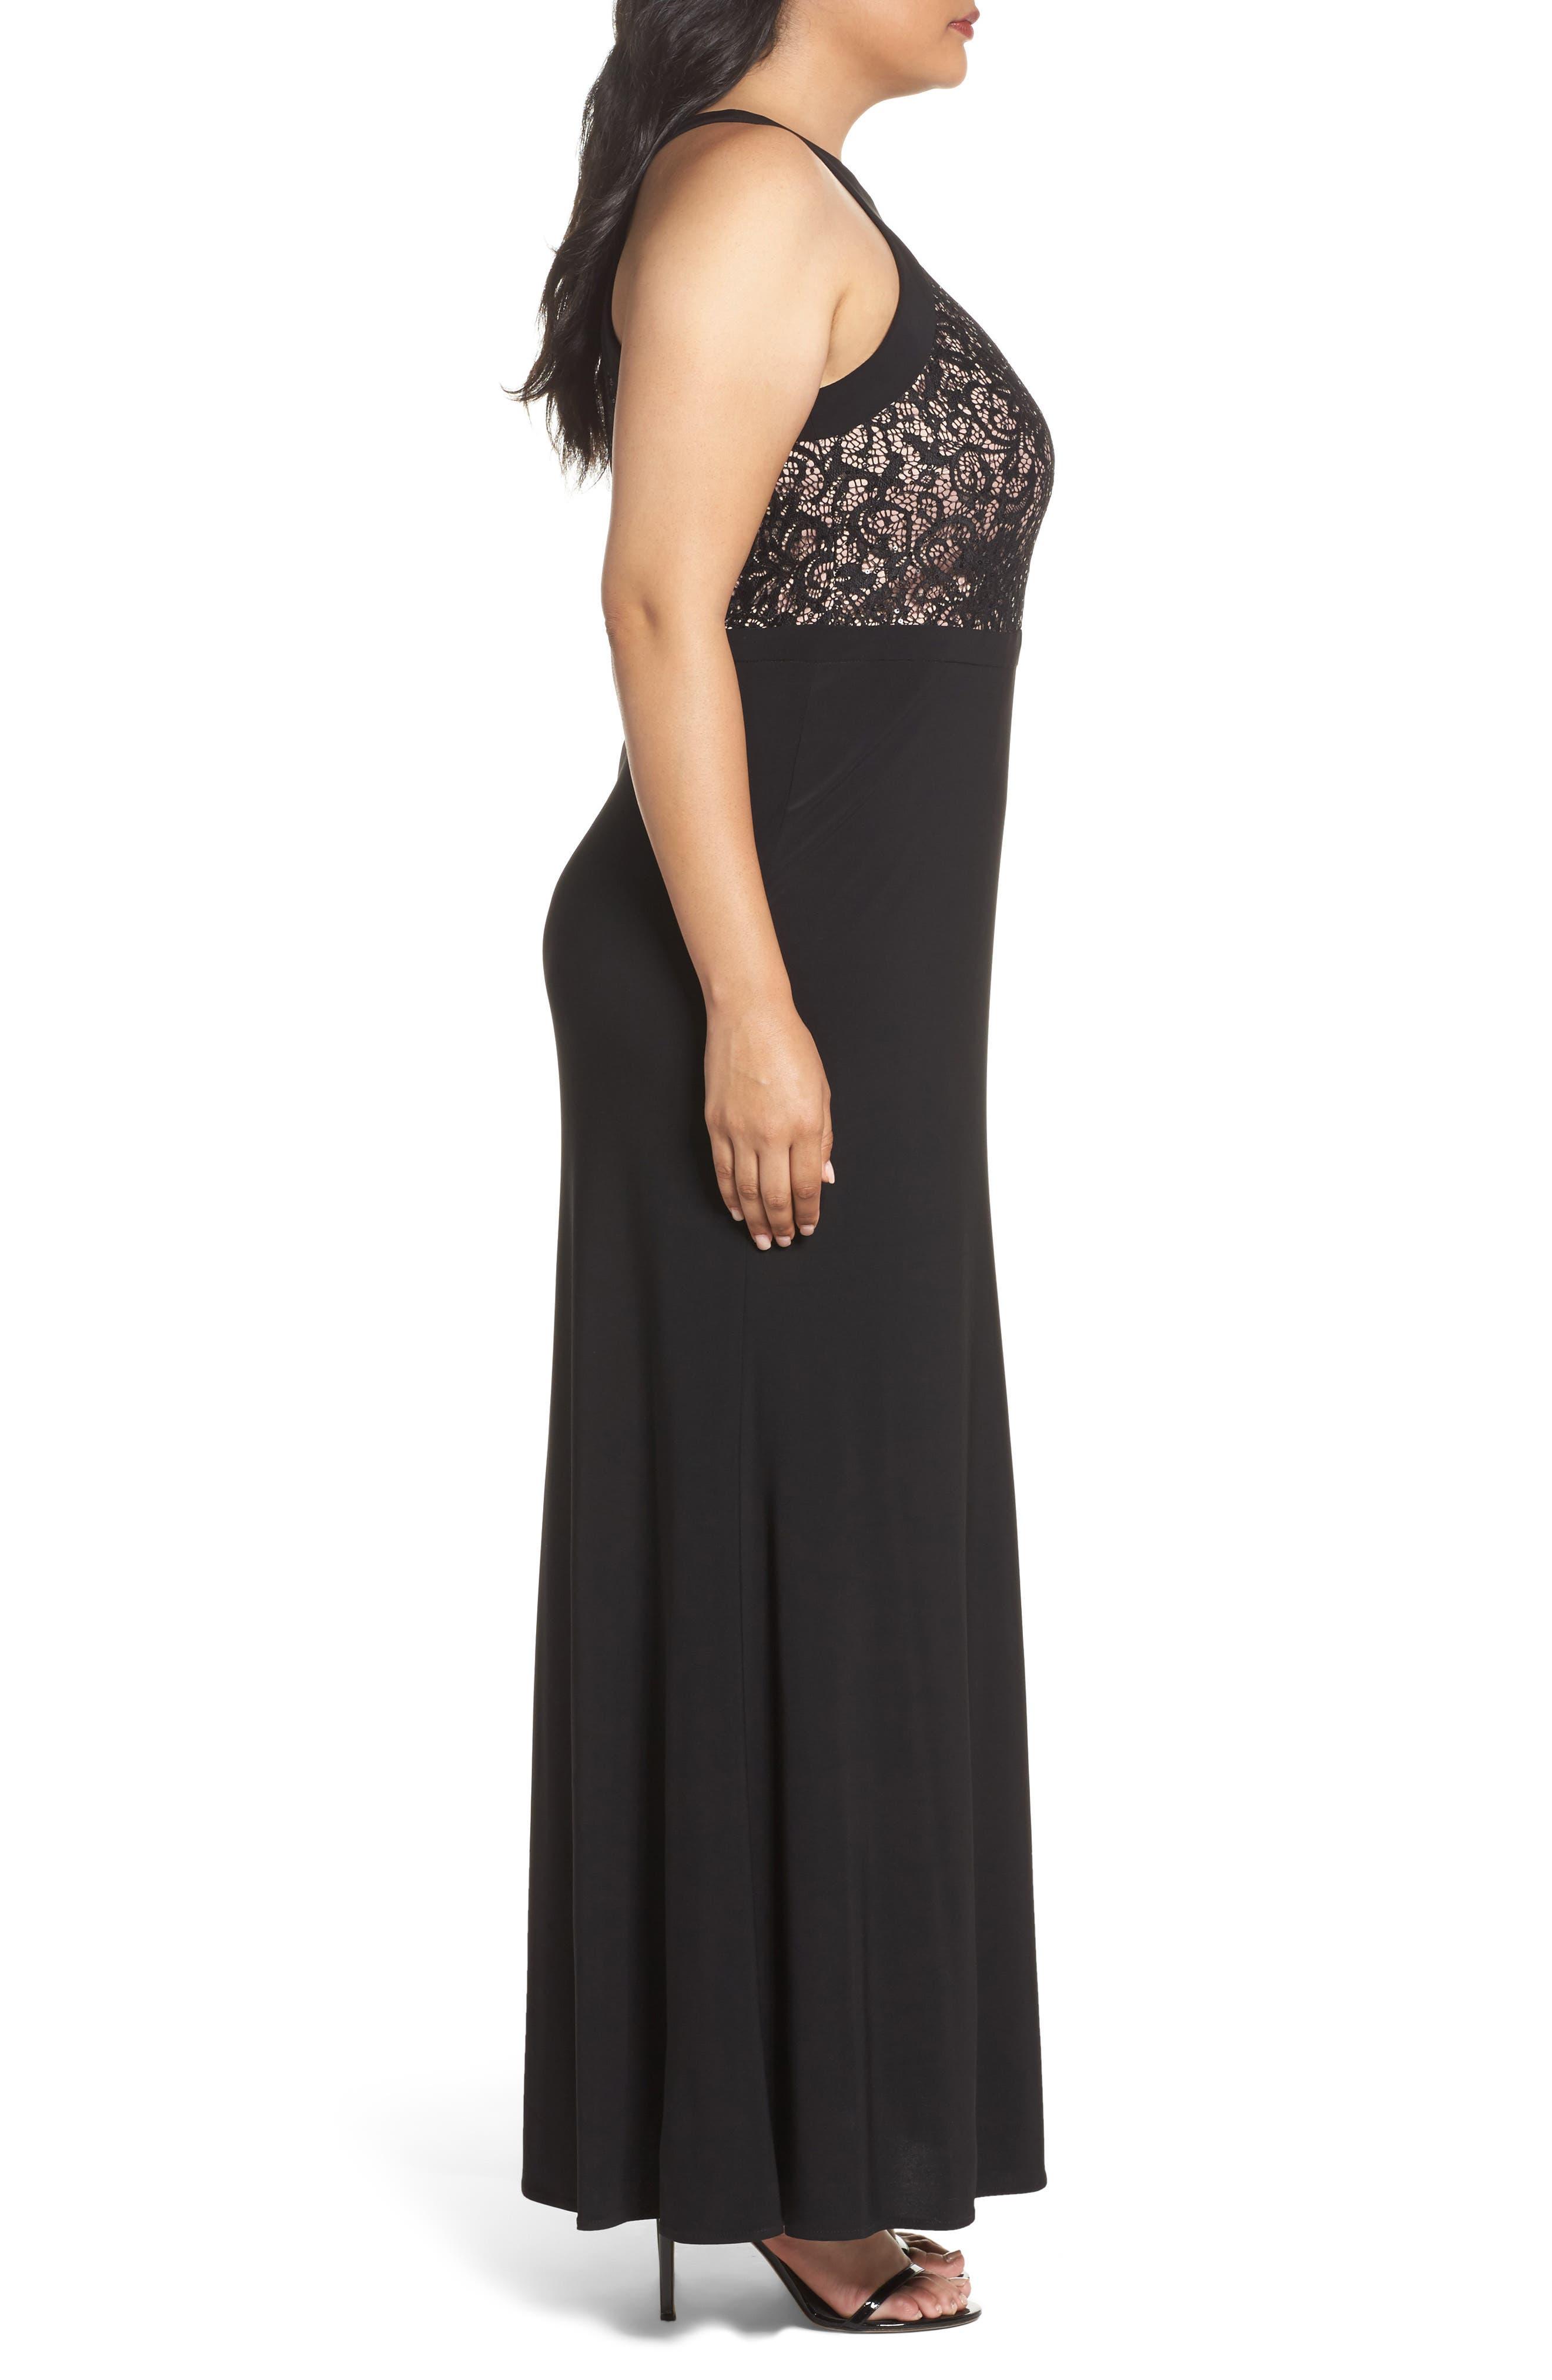 MORGAN & CO.,                             Lace Bodice Dress,                             Alternate thumbnail 3, color,                             BLACK/ NUDE